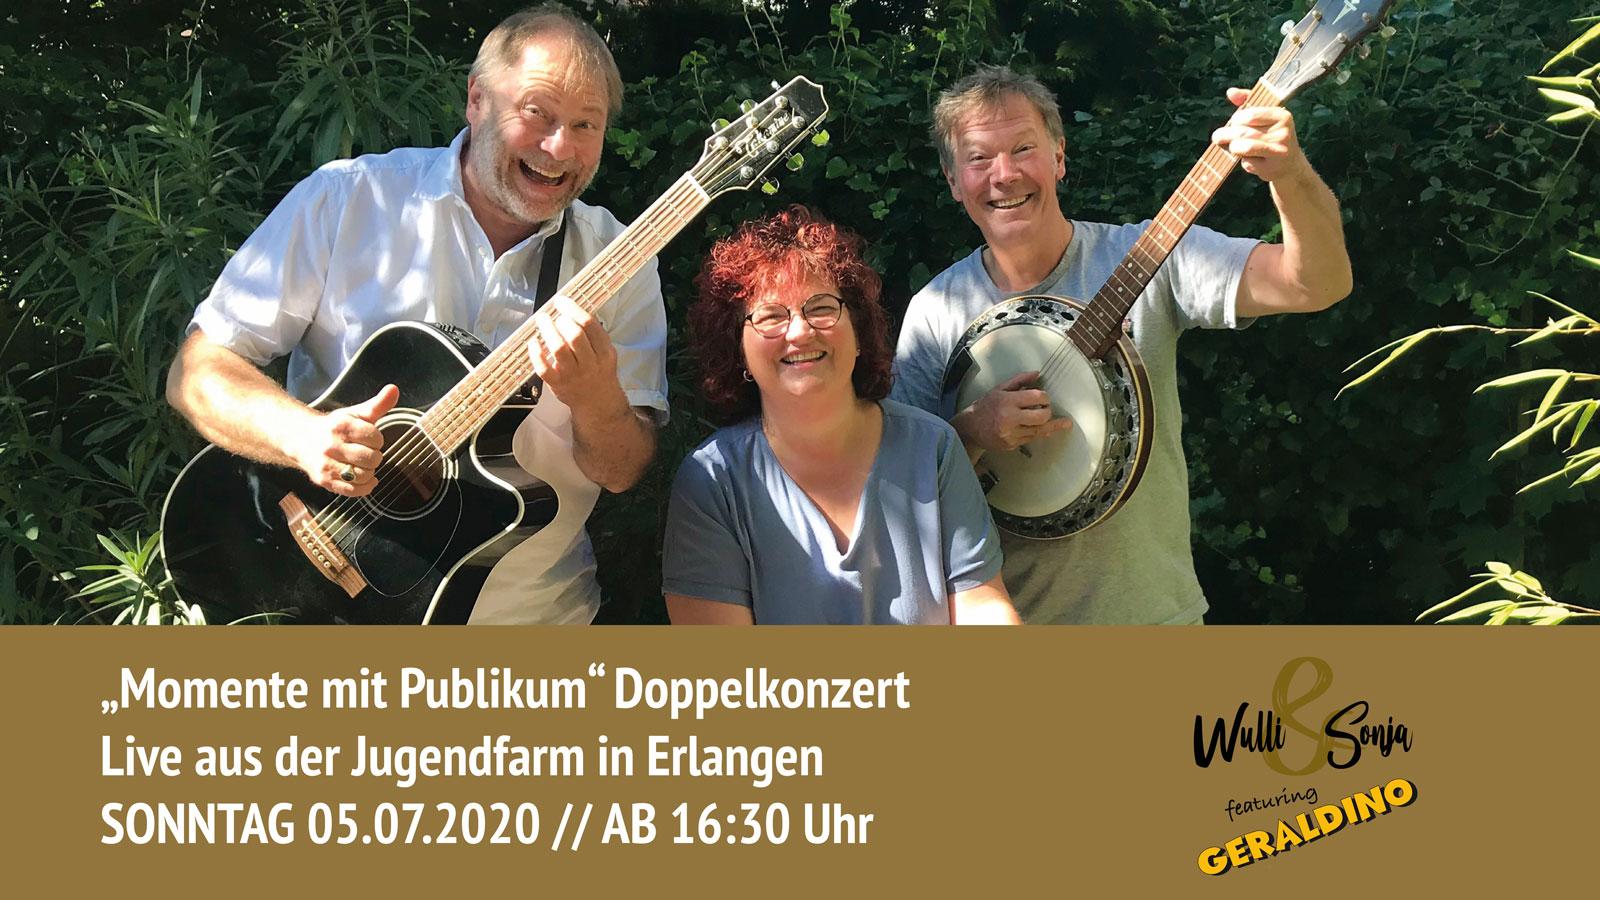 Wulli & Sonja feat. Geraldino Open-Air Konzerte Momente mit Publikum